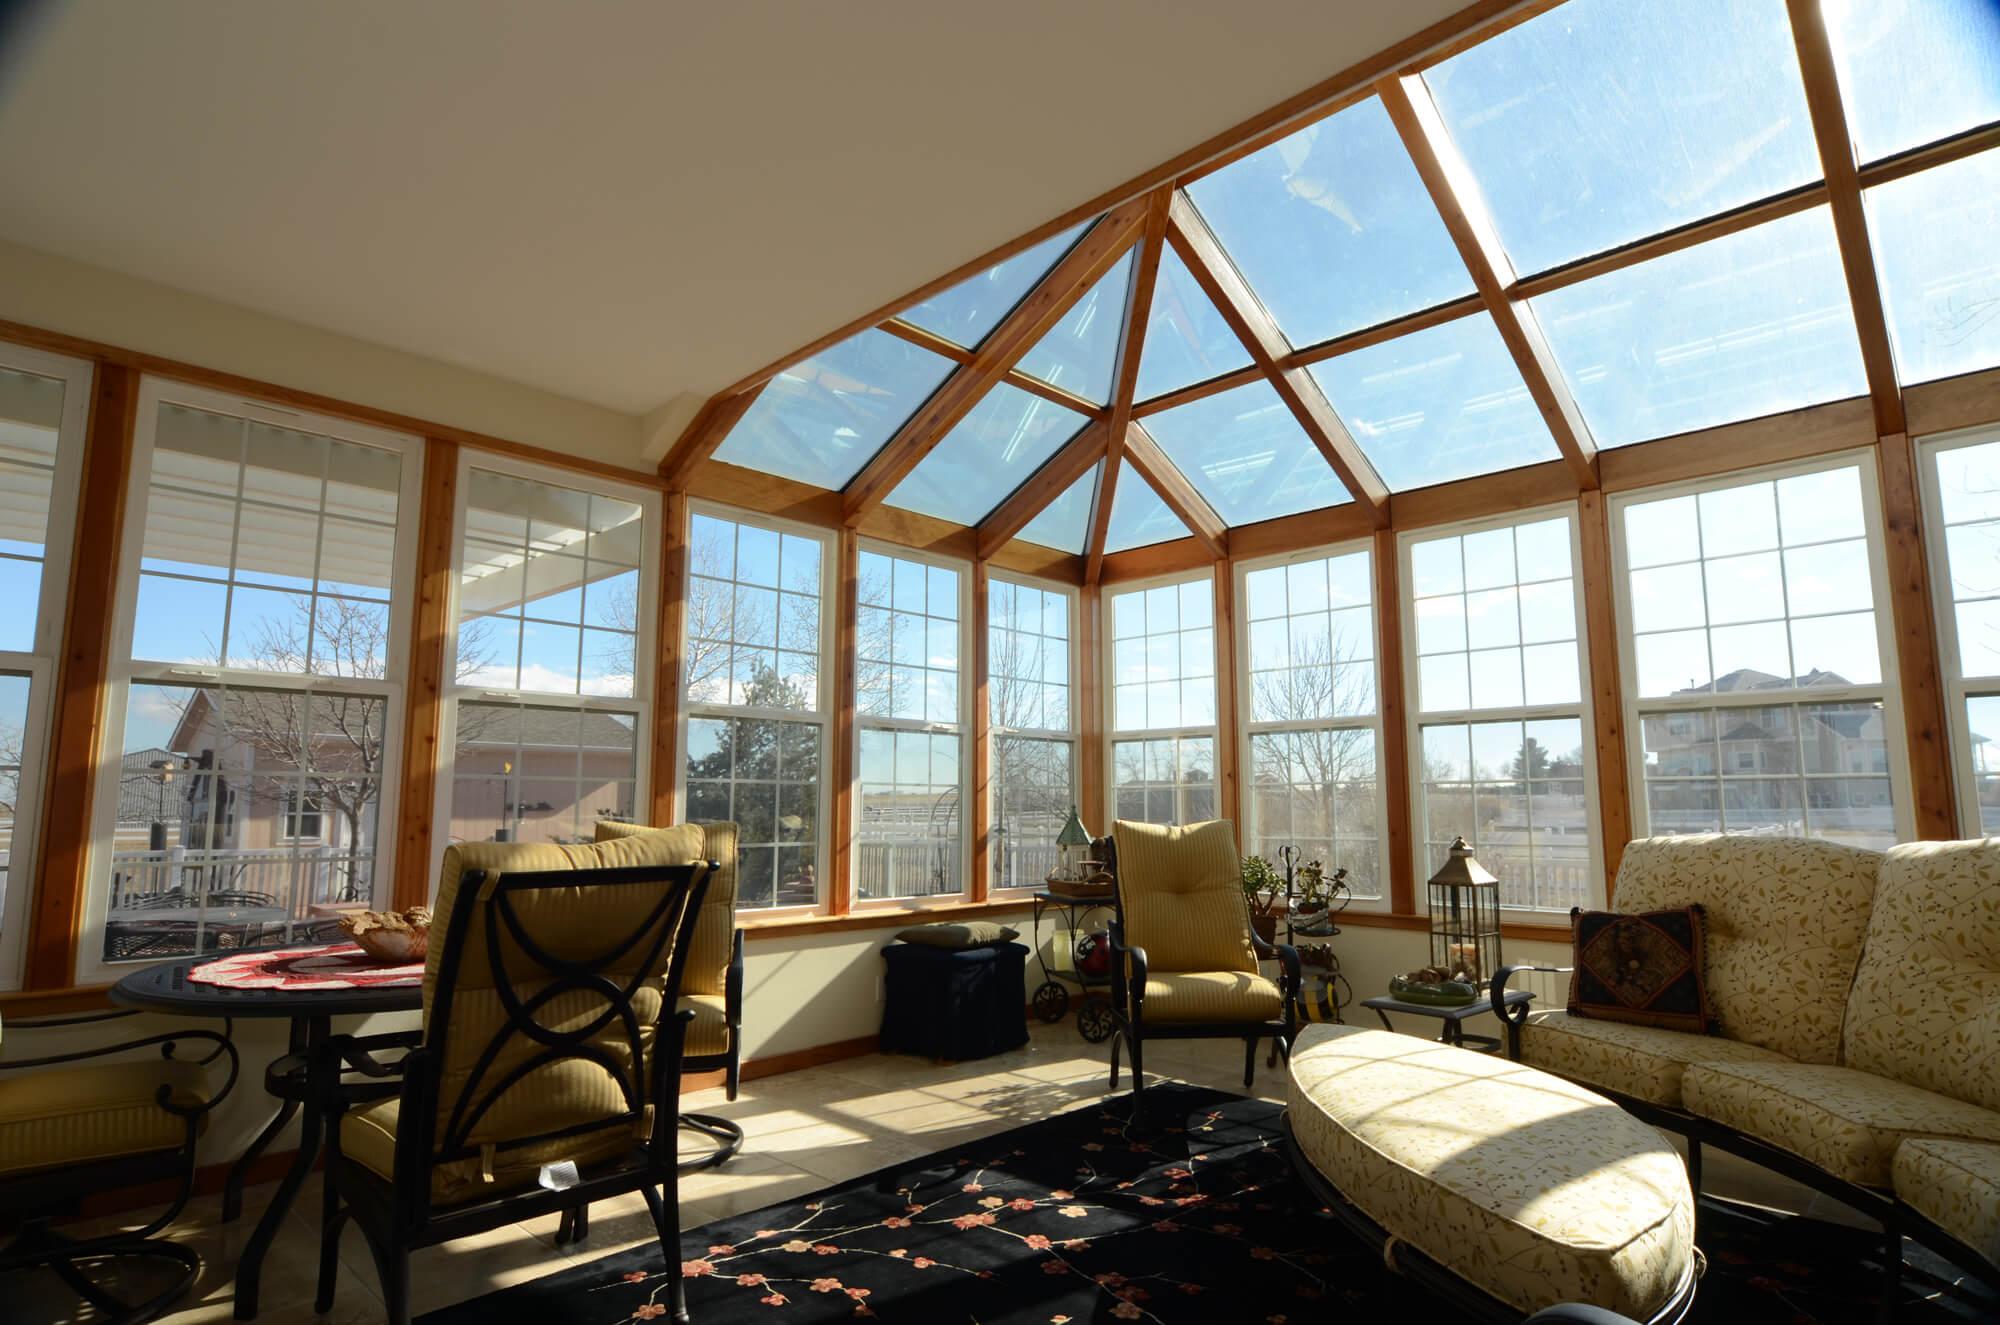 colorado_sunroom_and_window_distributors_wood_sunrooms_top_quality.jpg